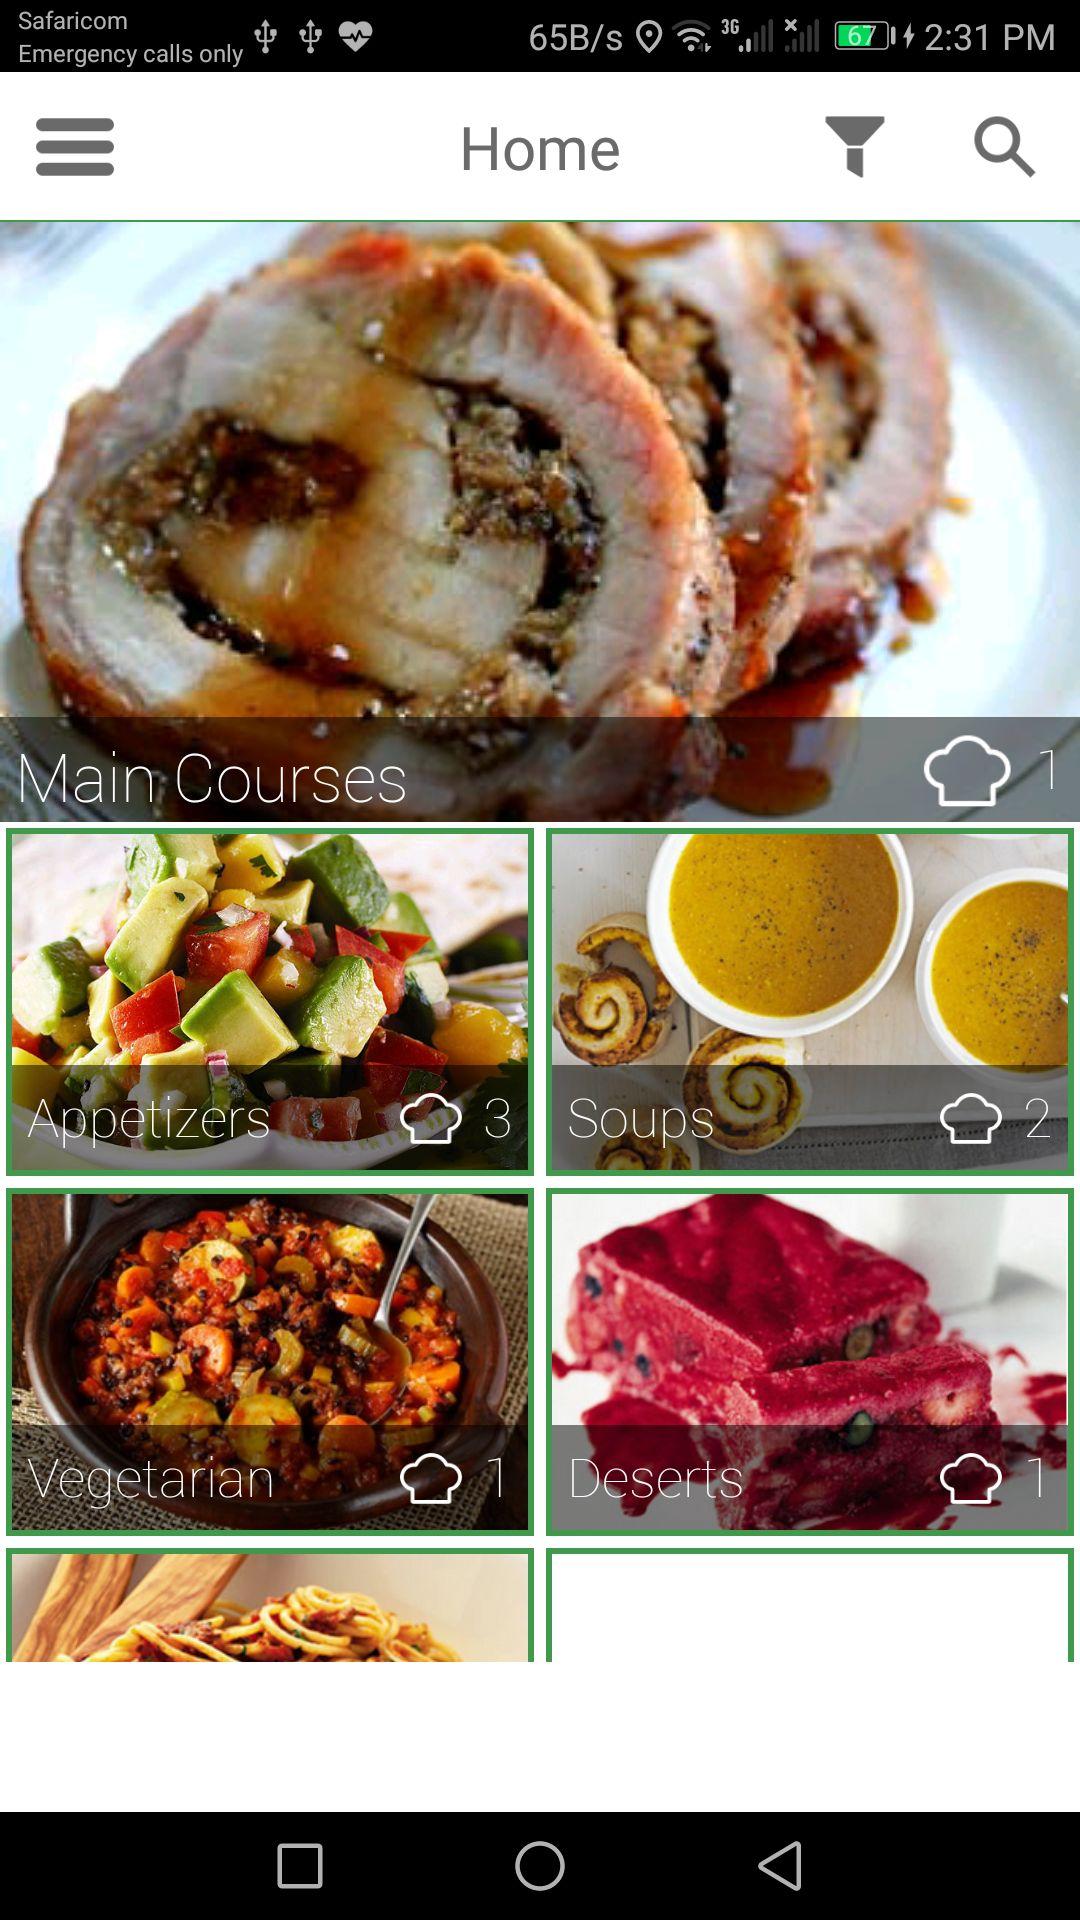 Recipe app android source code food app templates for android recipe app android source code screenshot 1 forumfinder Gallery